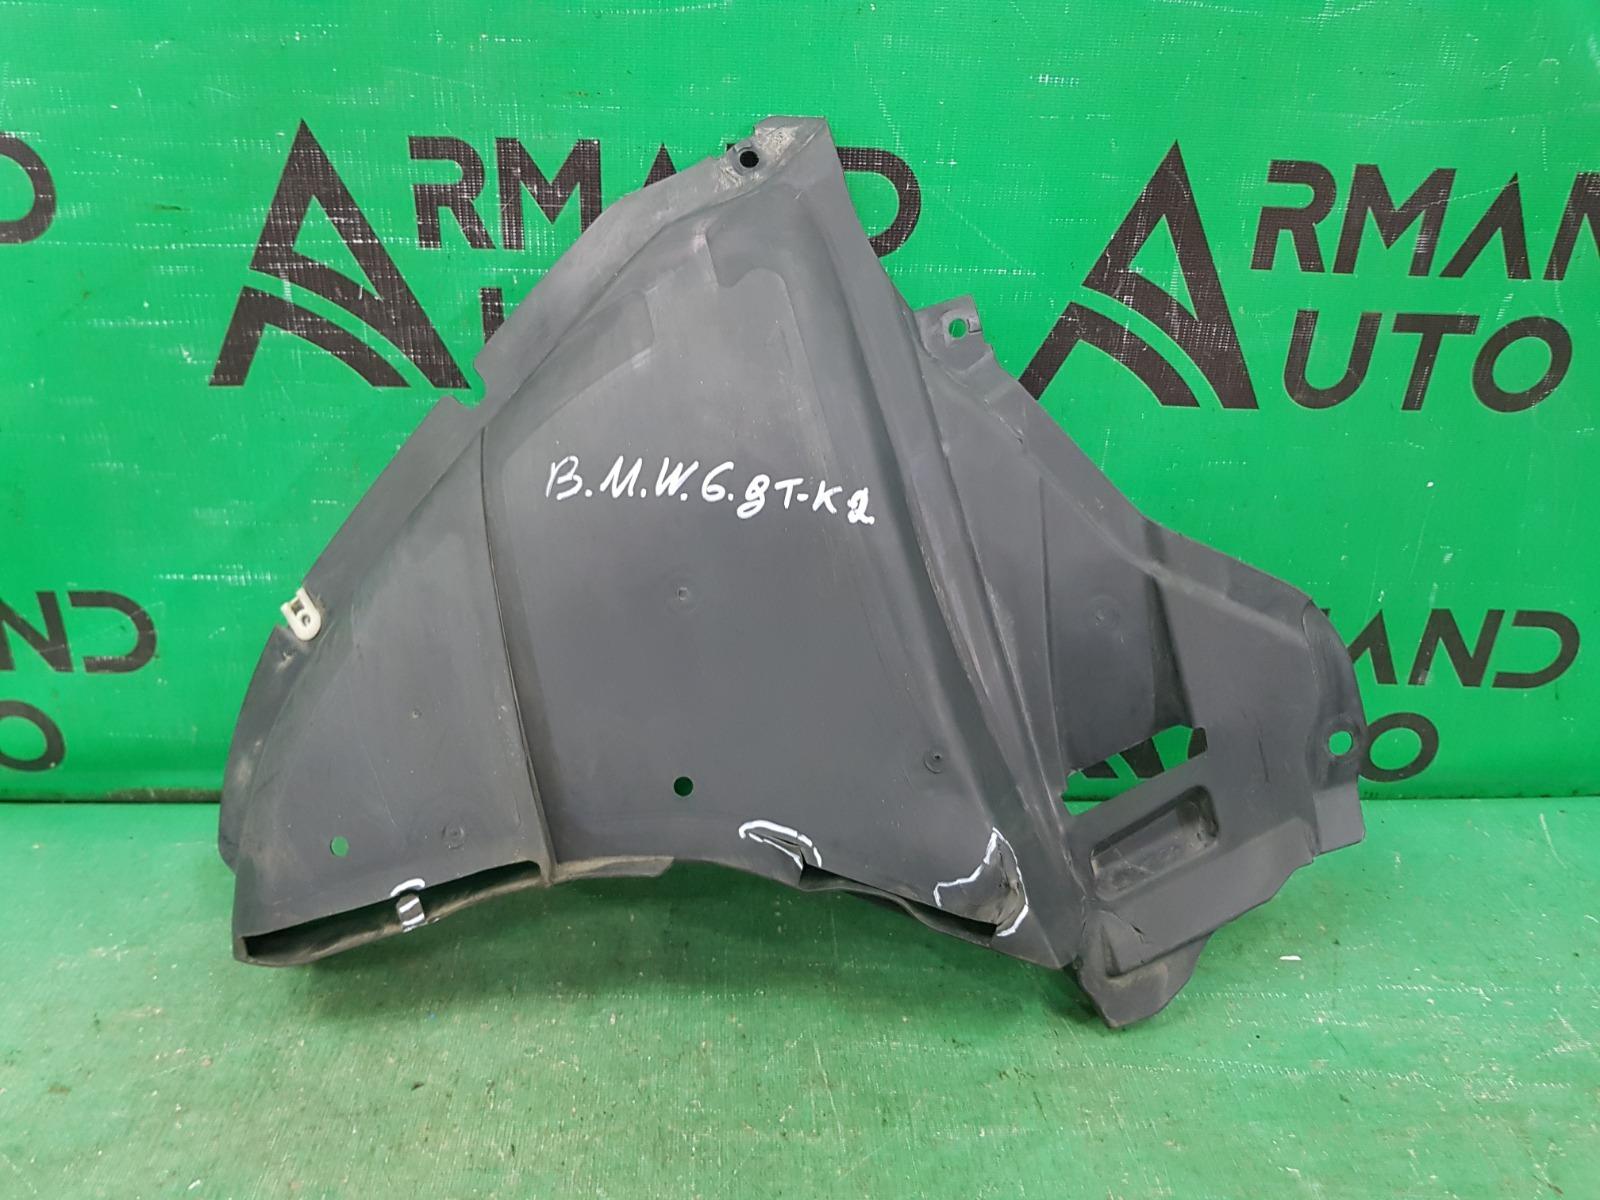 Пыльник бампера Bmw 6 Gt G32 2017 передний правый нижний (б/у)